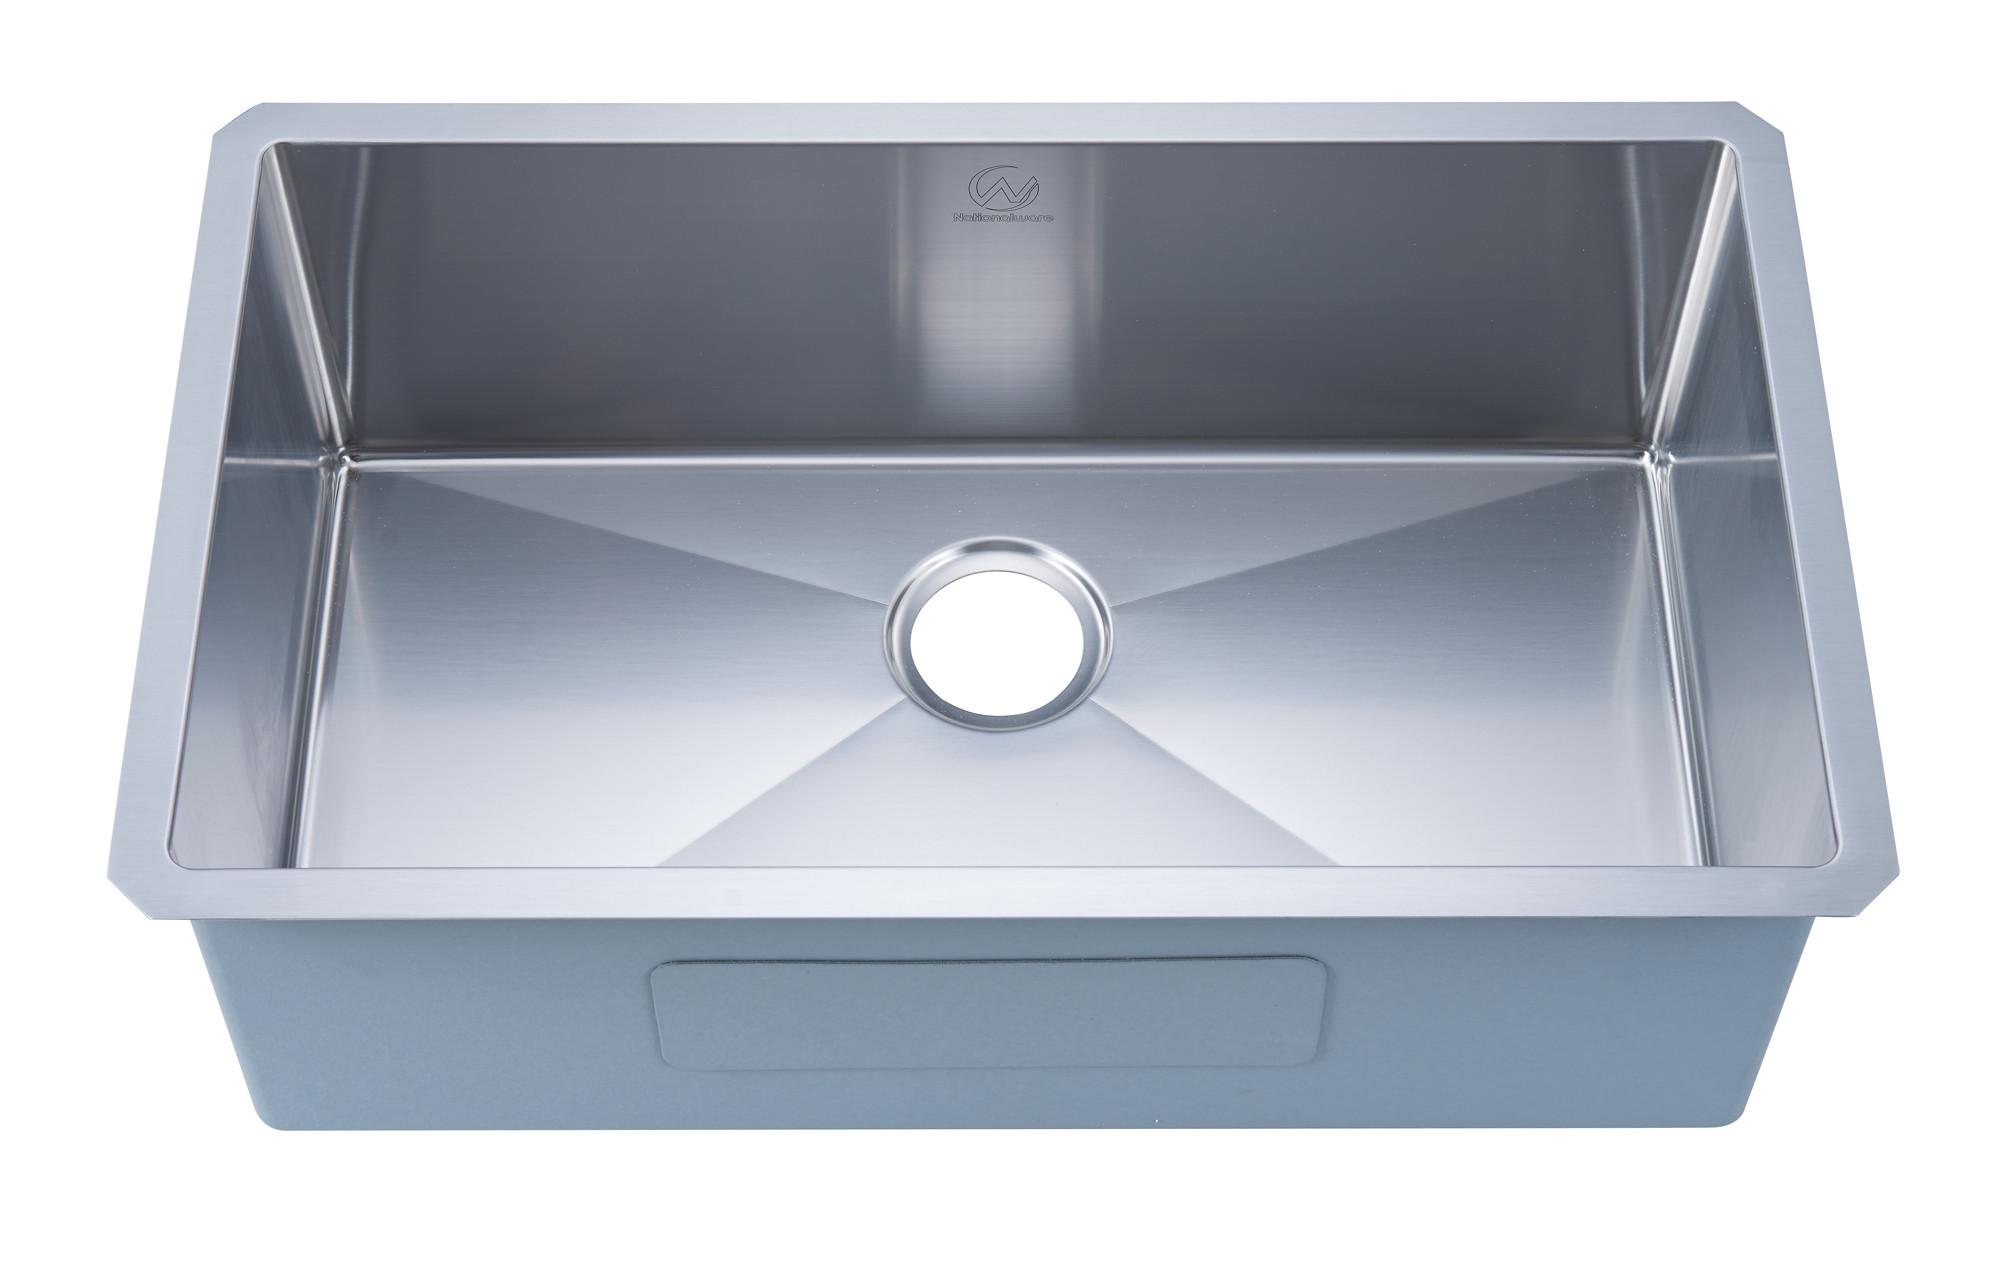 Stufurhome NW-3018S Undermount Stainless Steel 30 Inch Single Bowl Kitchen Sink